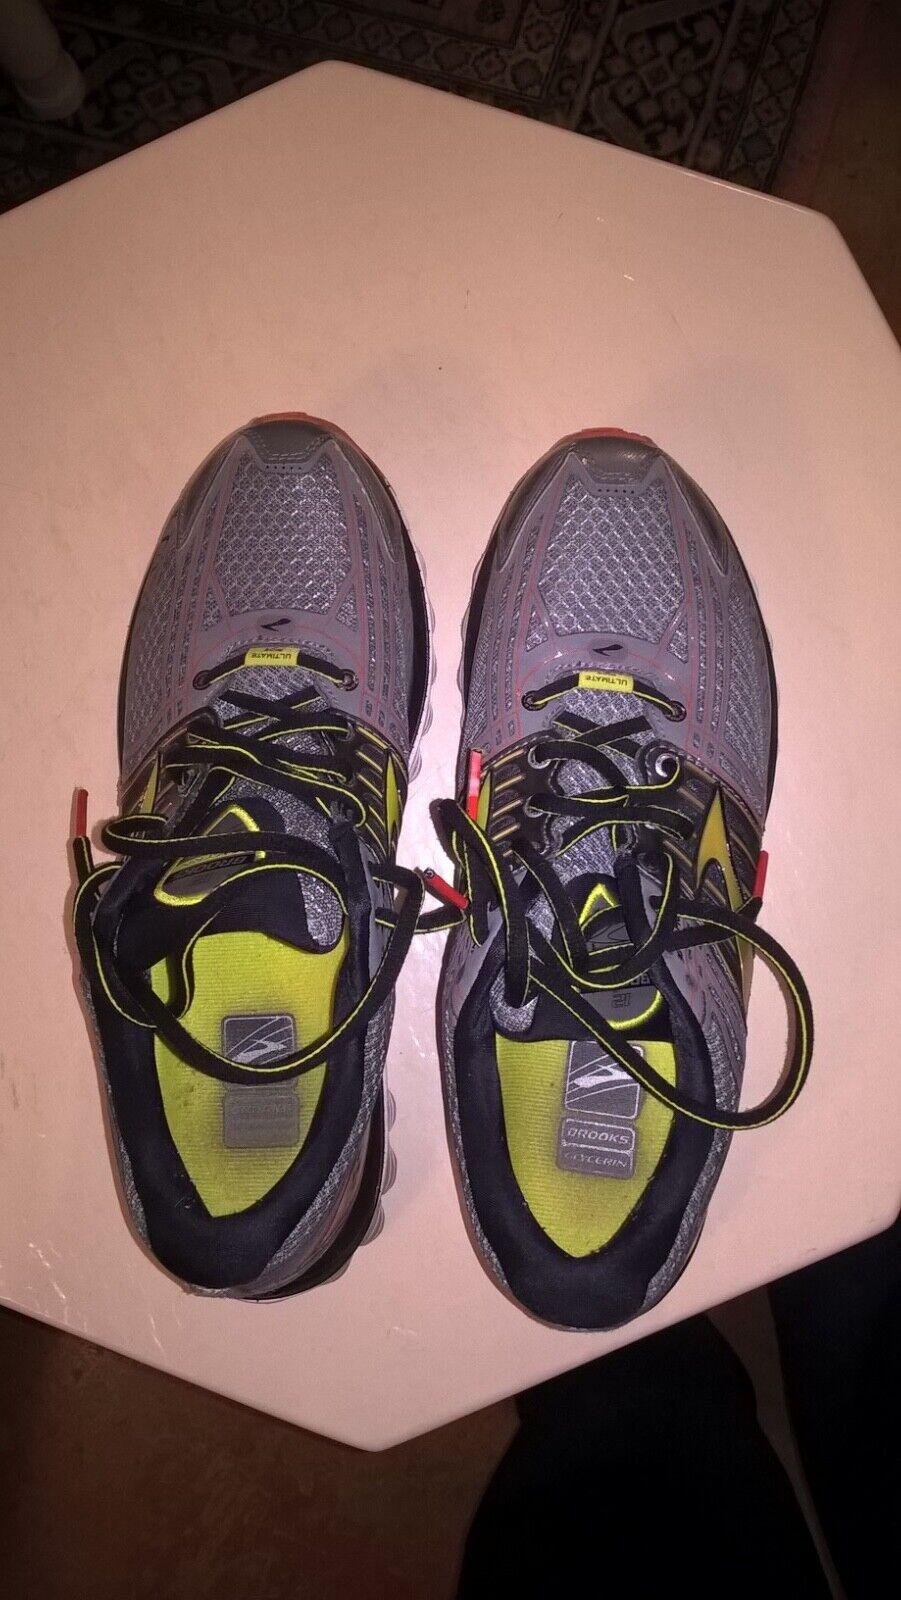 813c950e119 Men's Dark Grey yellow stripes Brooks Glycerine 12, size 9.5, in mint  condition